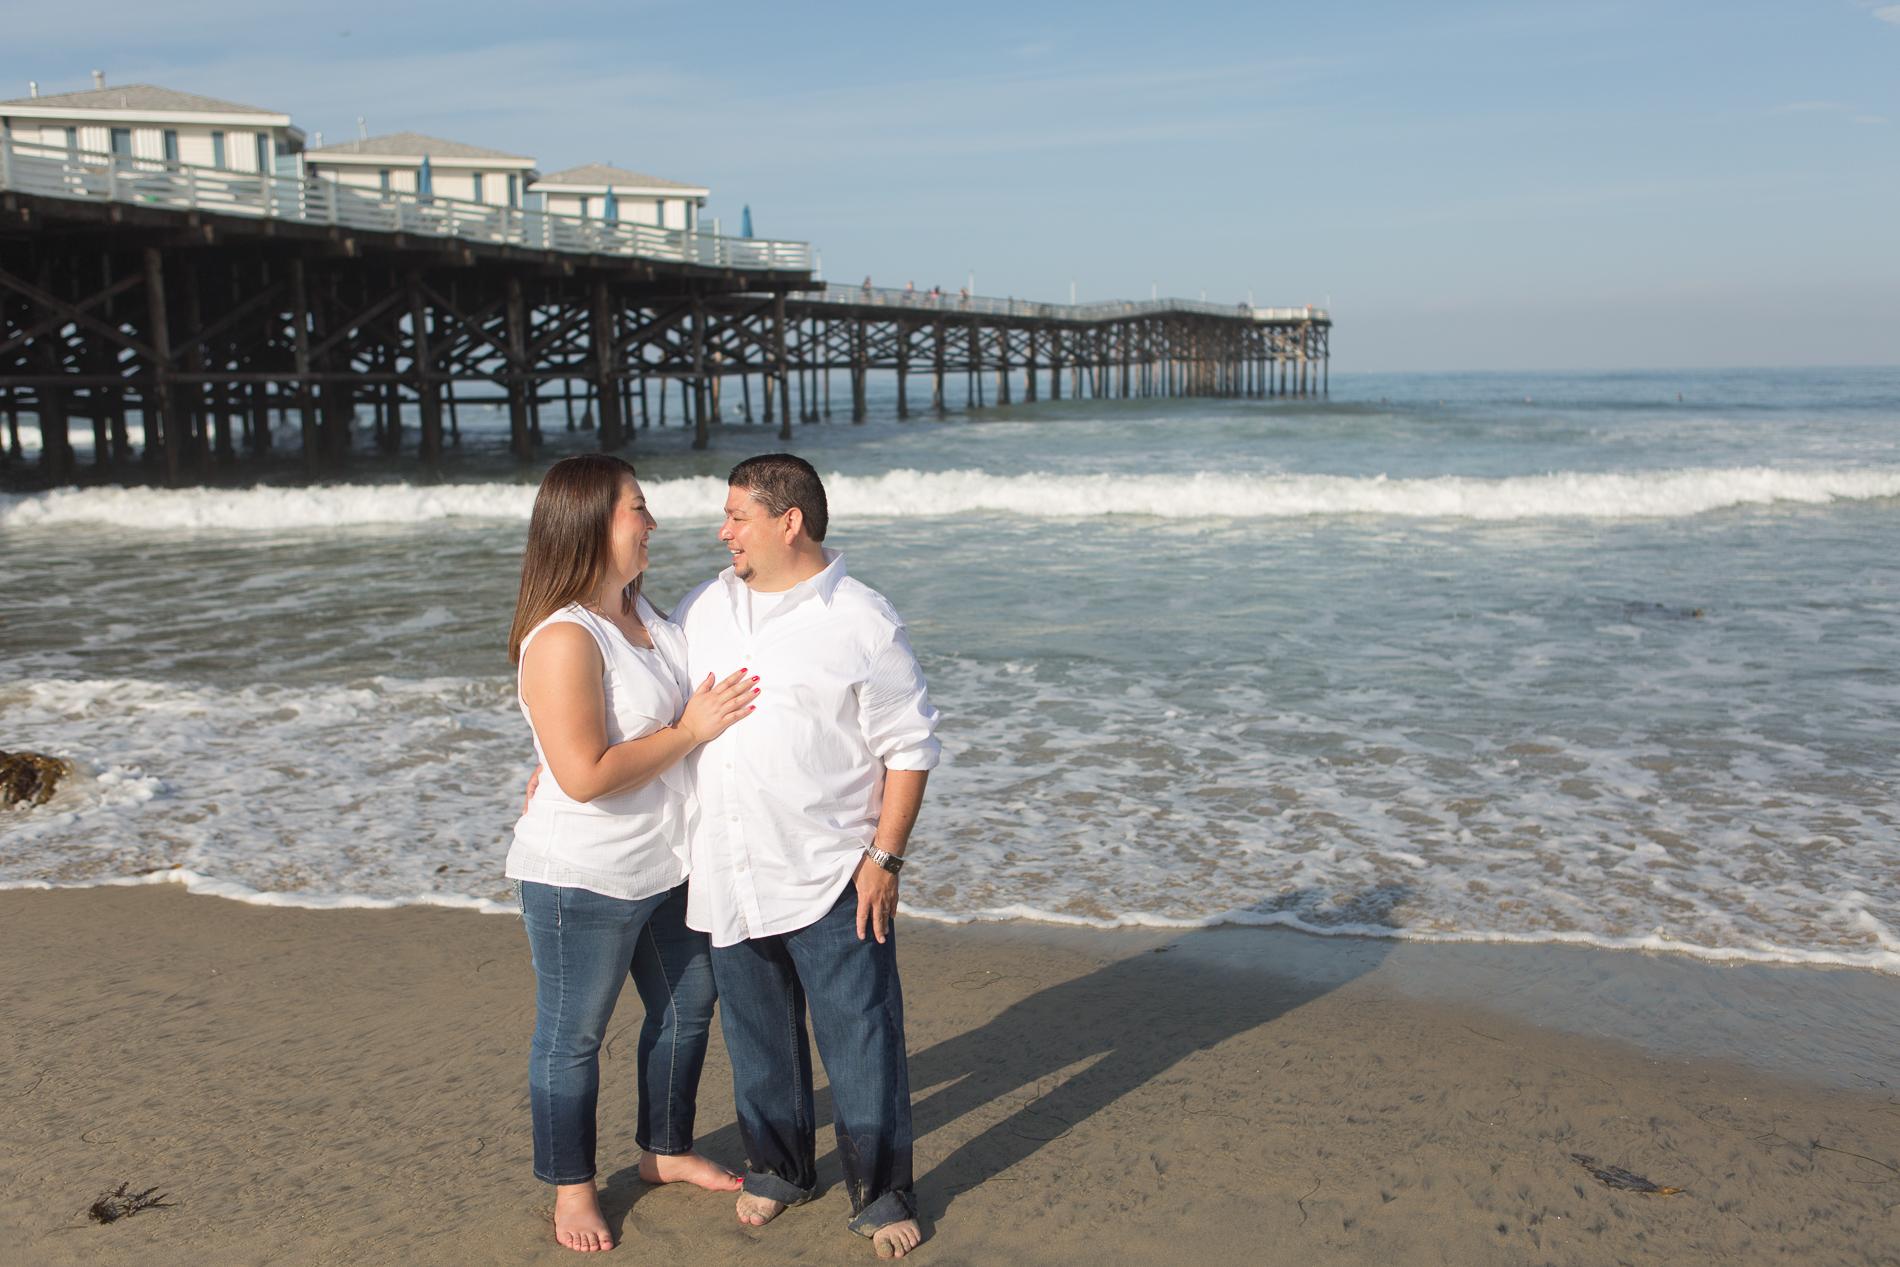 San.Diego.Family.Vacation.Photographer.Christine.Dammann.Photography.GFWS-7.jpg